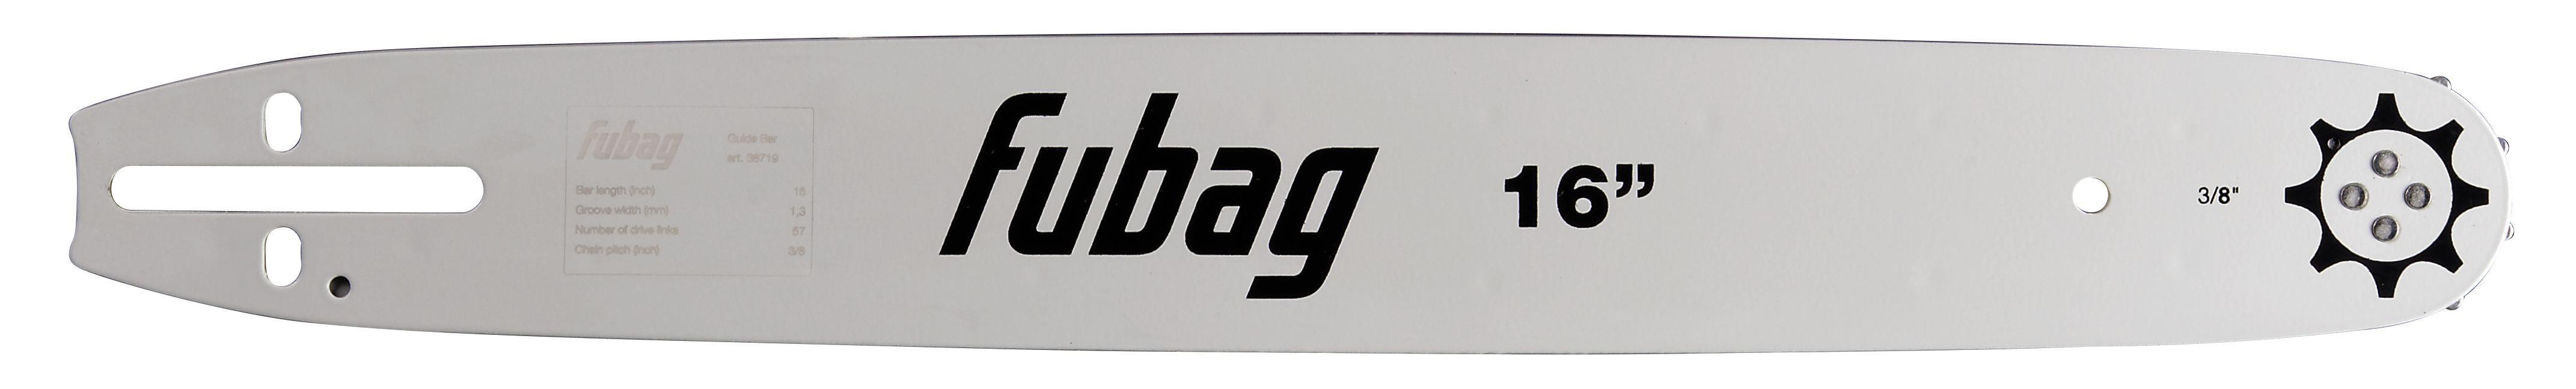 Шина Fubag 16 f41a инвертор fubag in 196